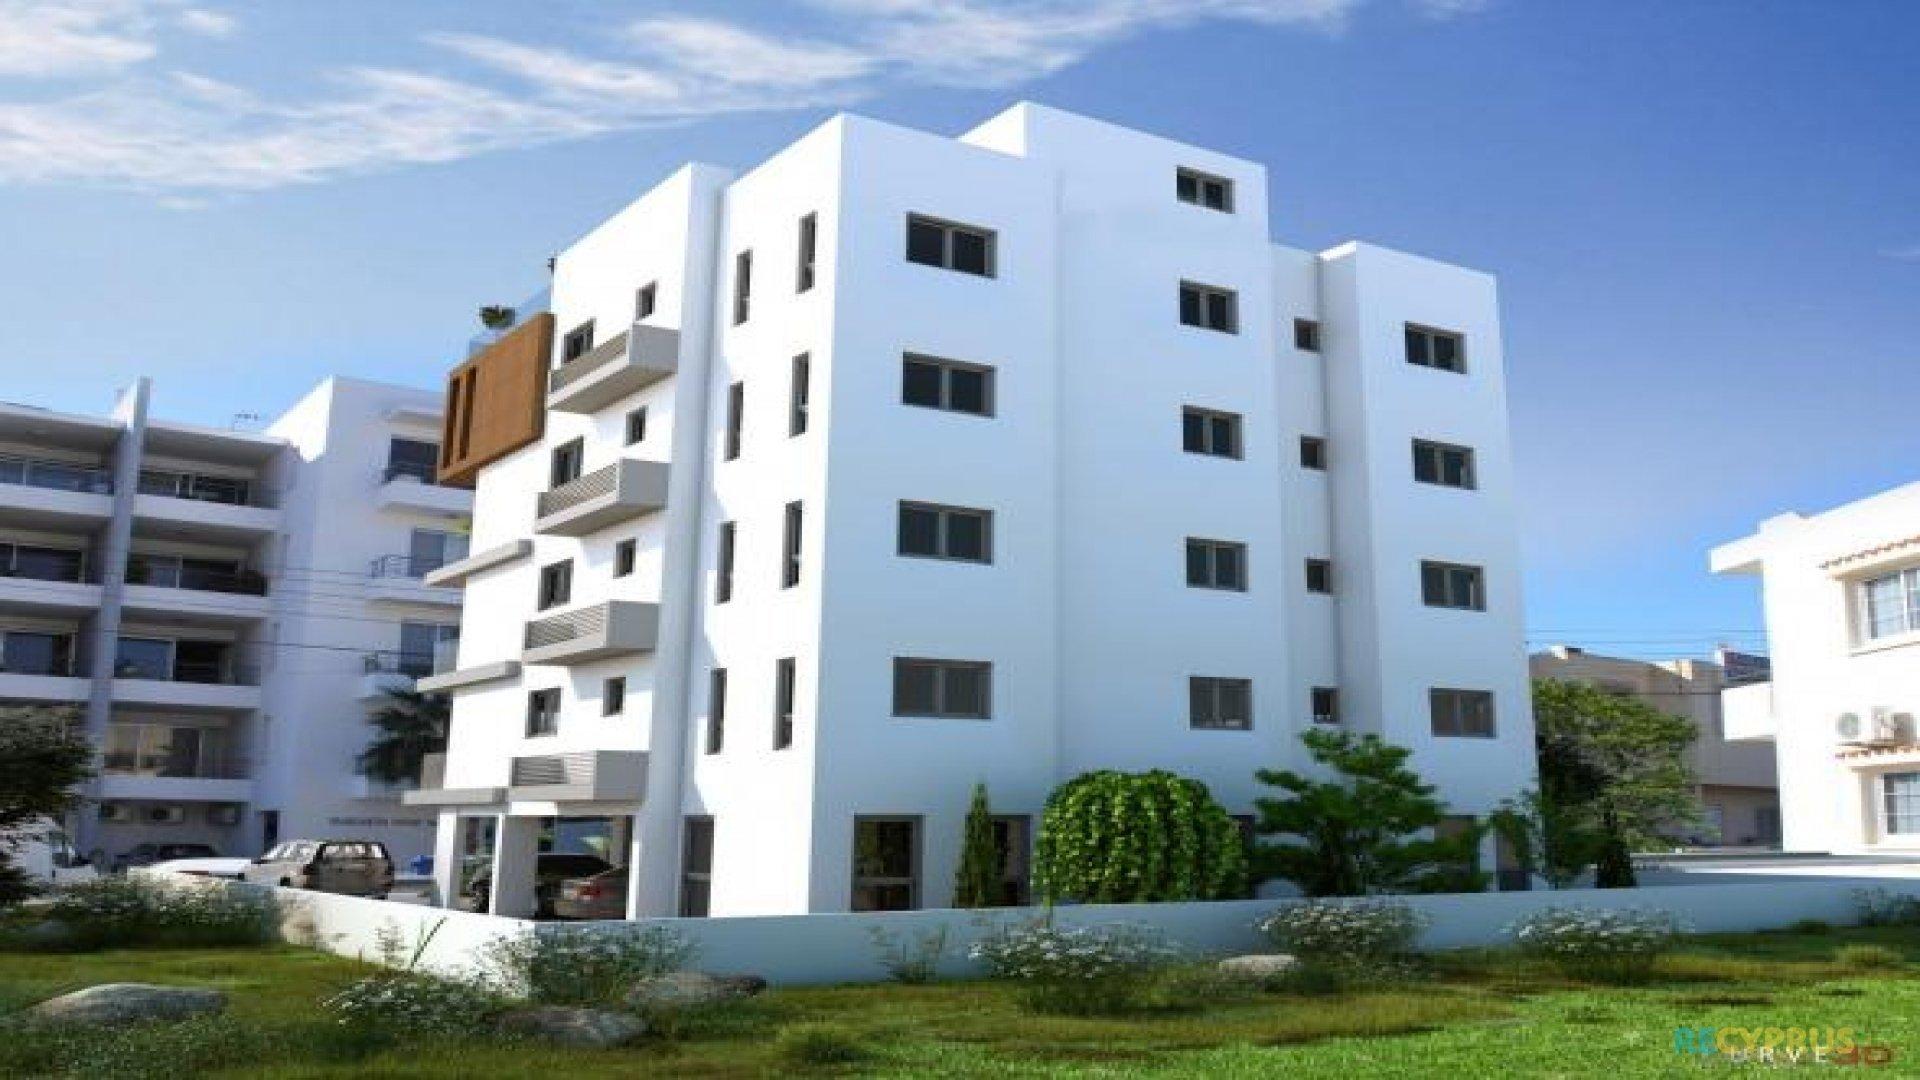 Apartment for sale City Center Larnaca Cyprus 12 3583